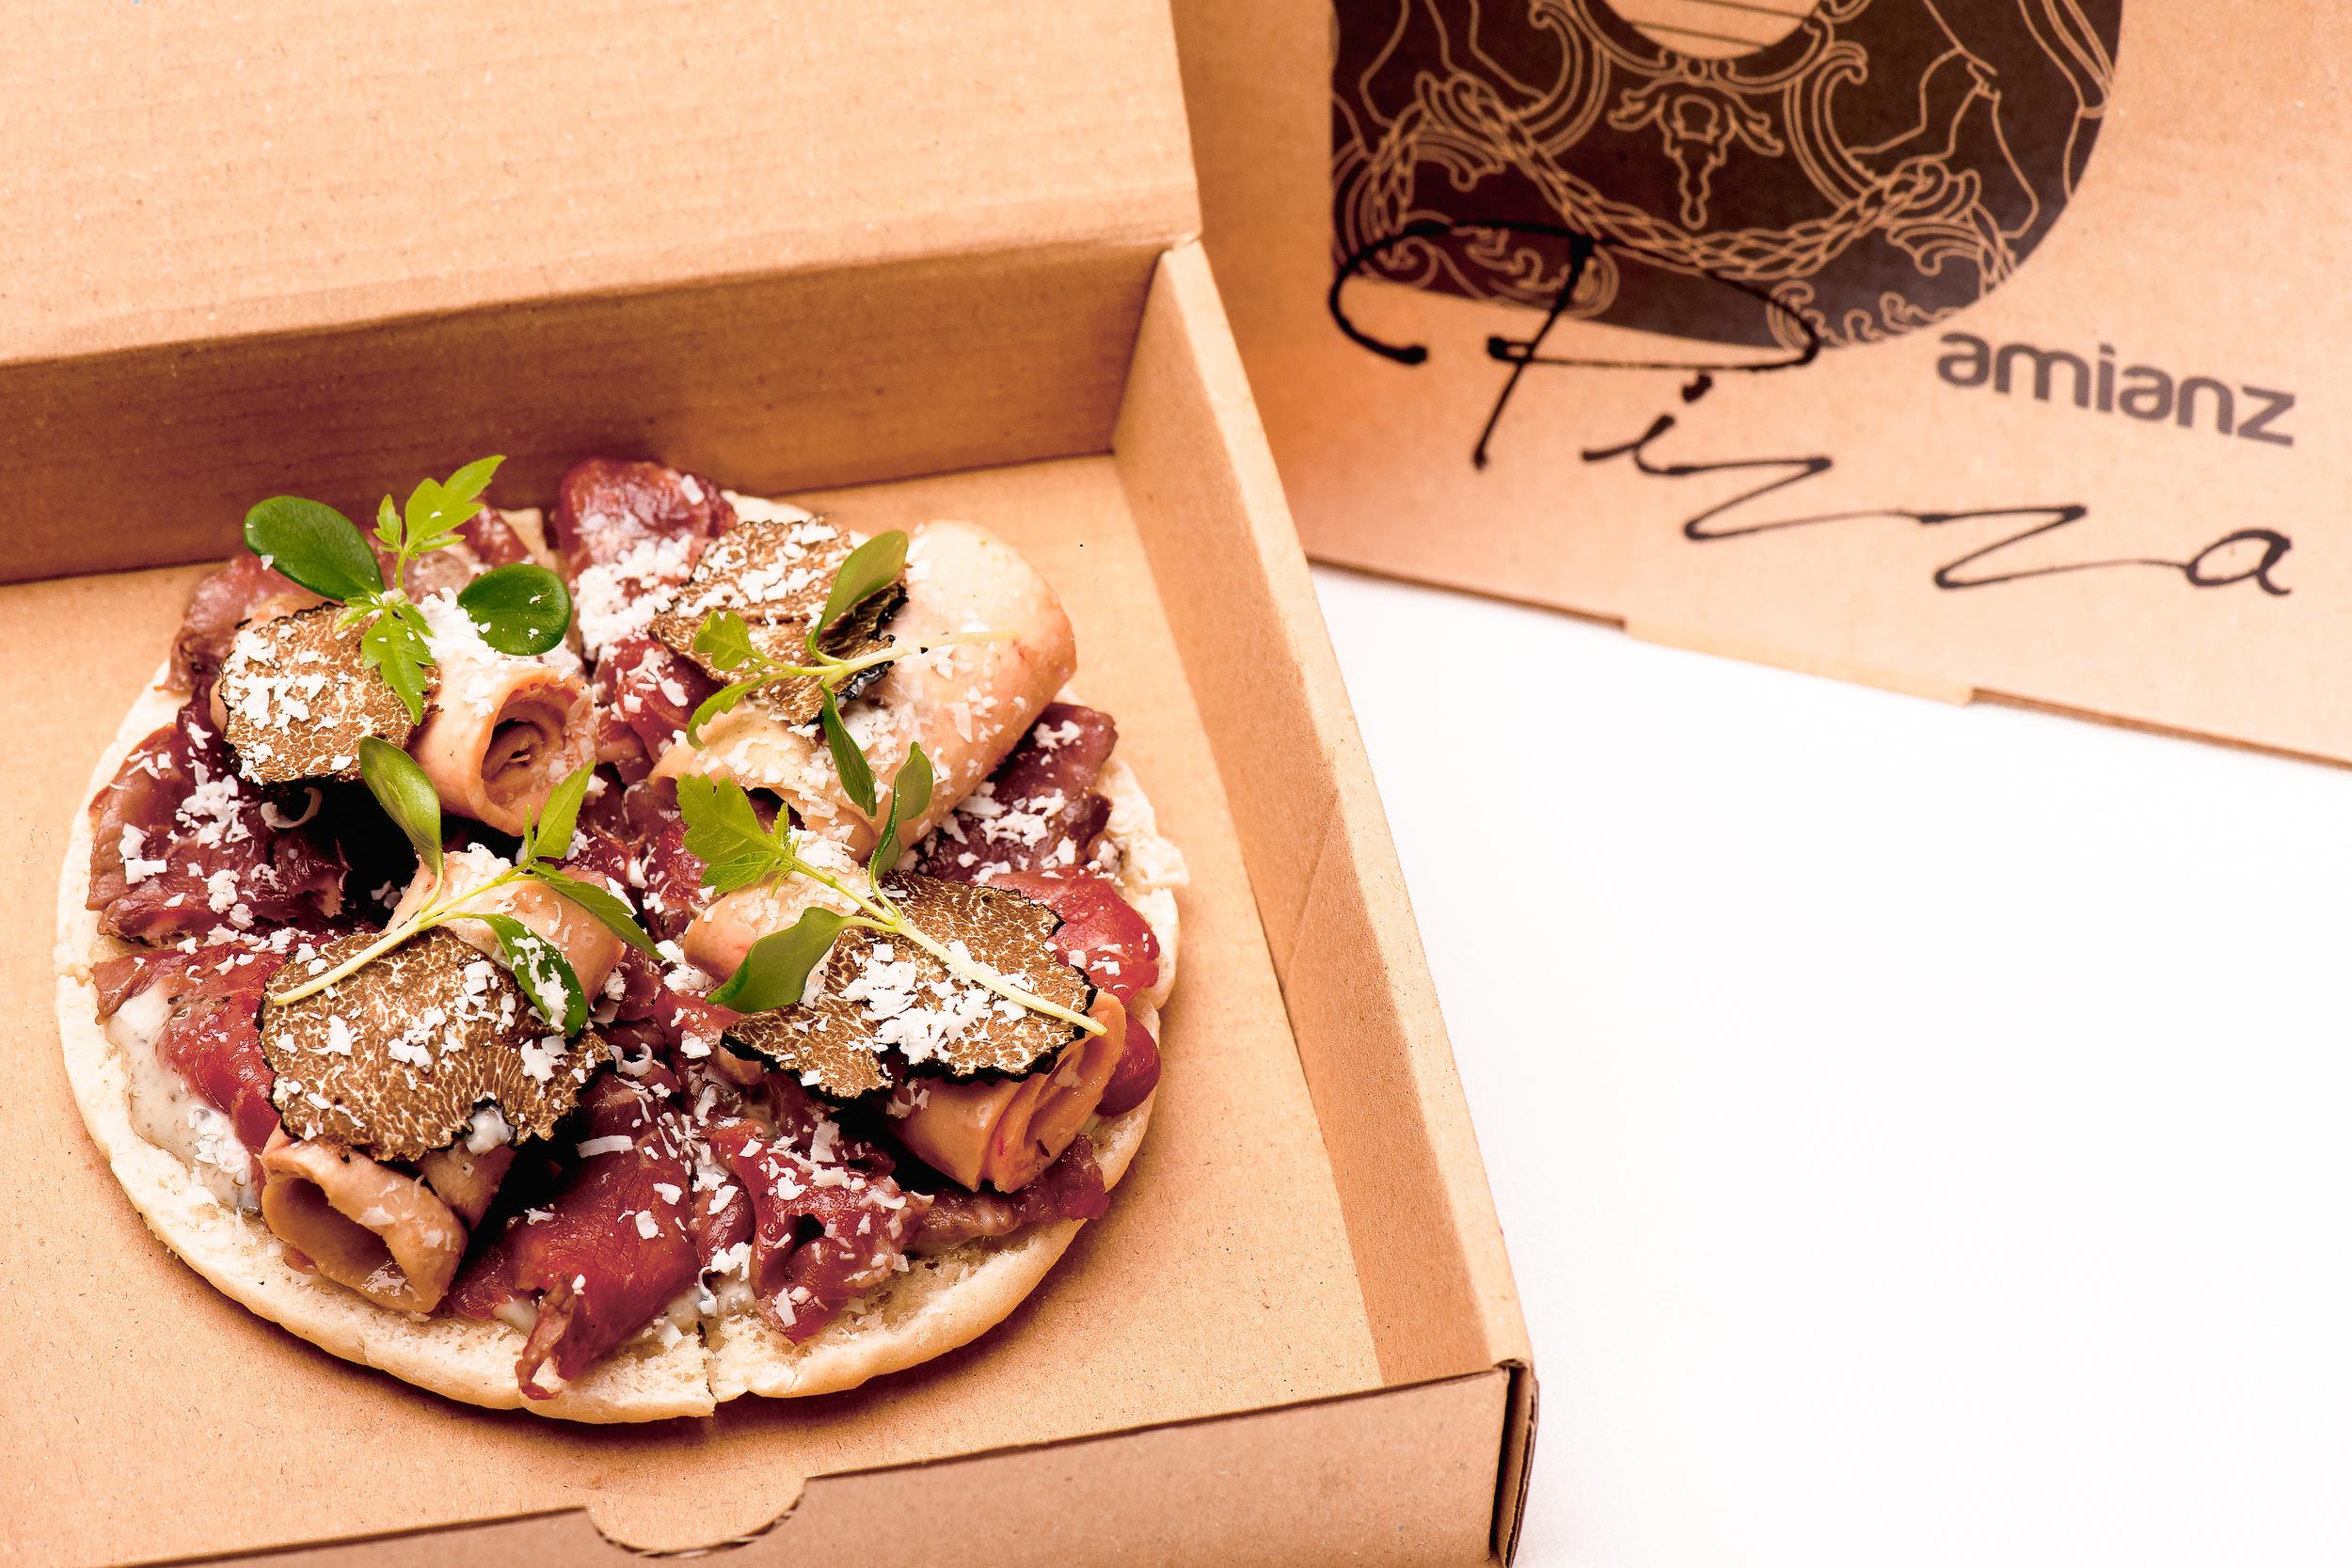 Food_Het_Arresthuis_20111102_0047-Edit.jpg